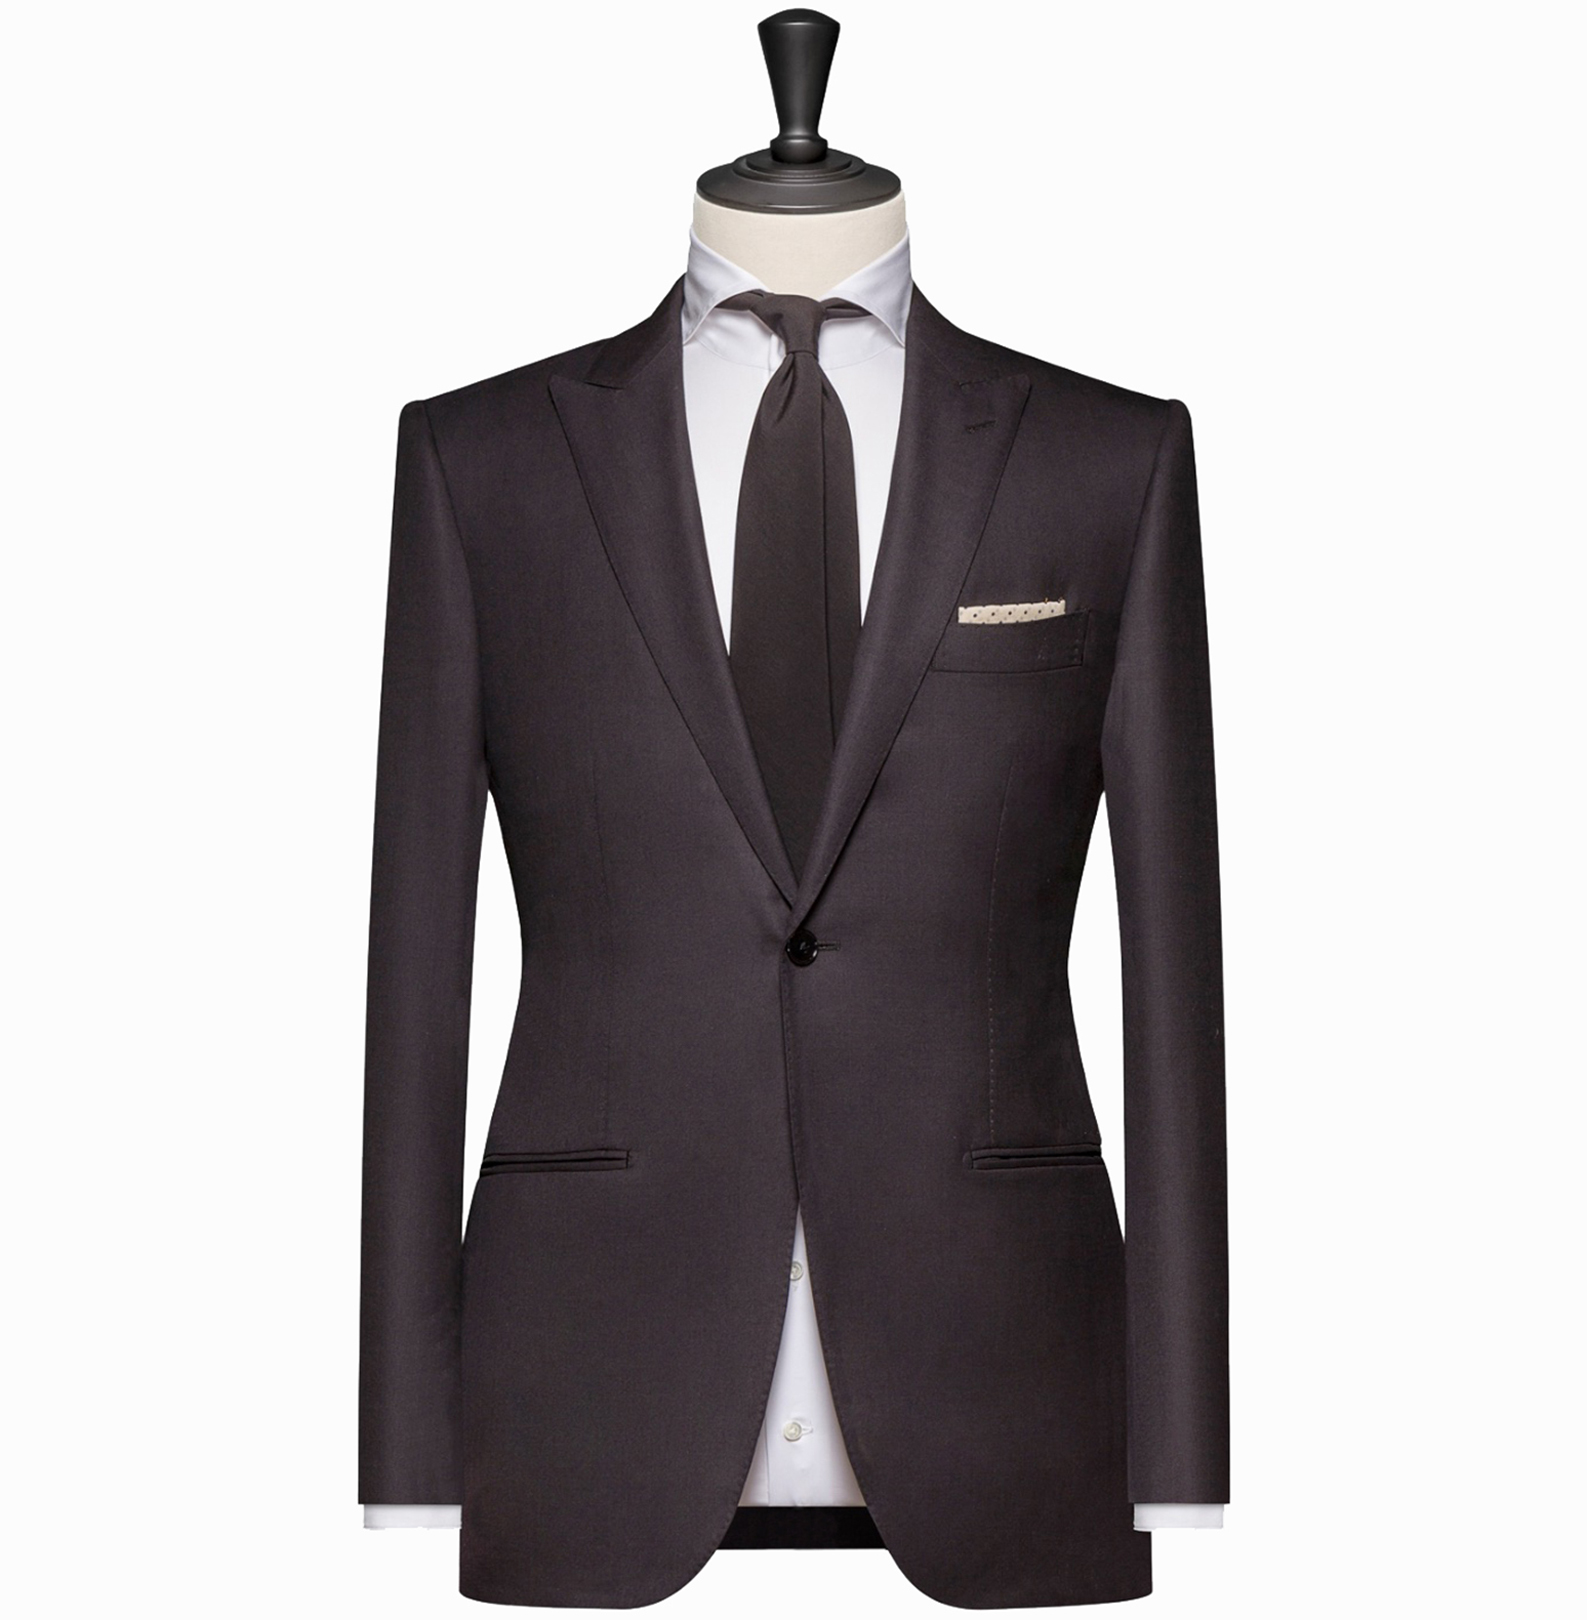 11_Suit_Black_Twill_4698WB0014.jpg